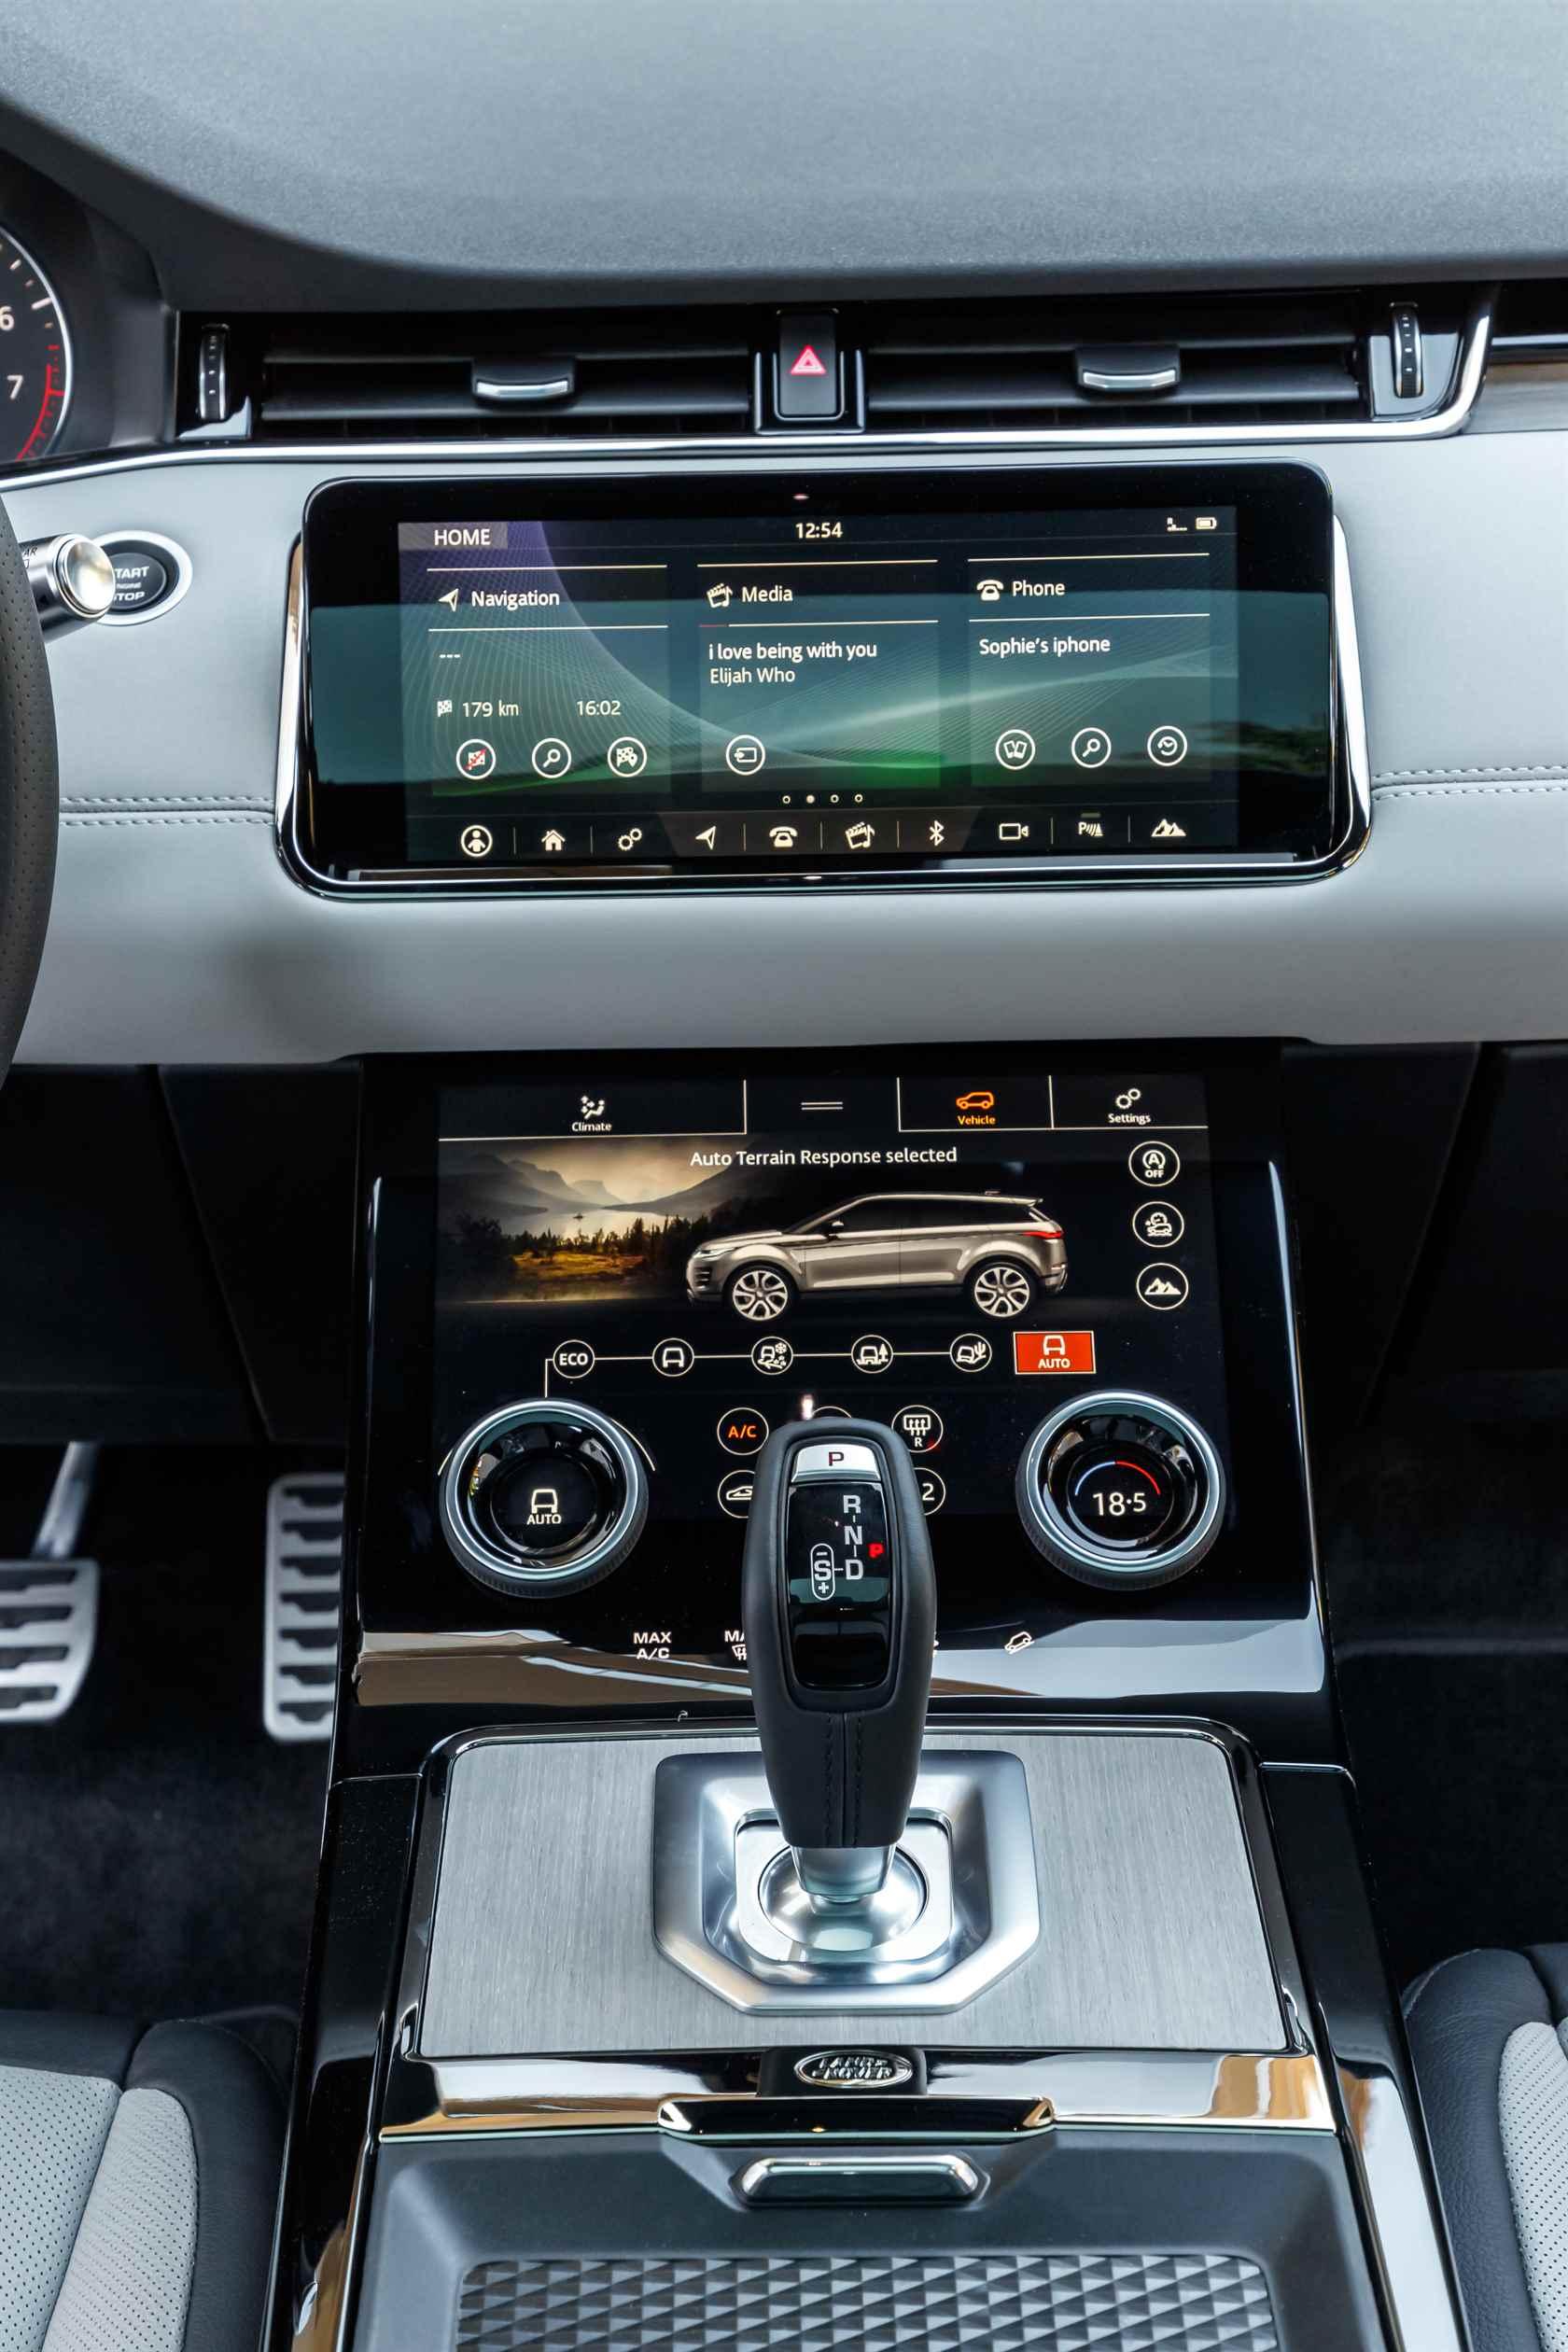 2020 Range Rover Evoque first drive review: Crisper